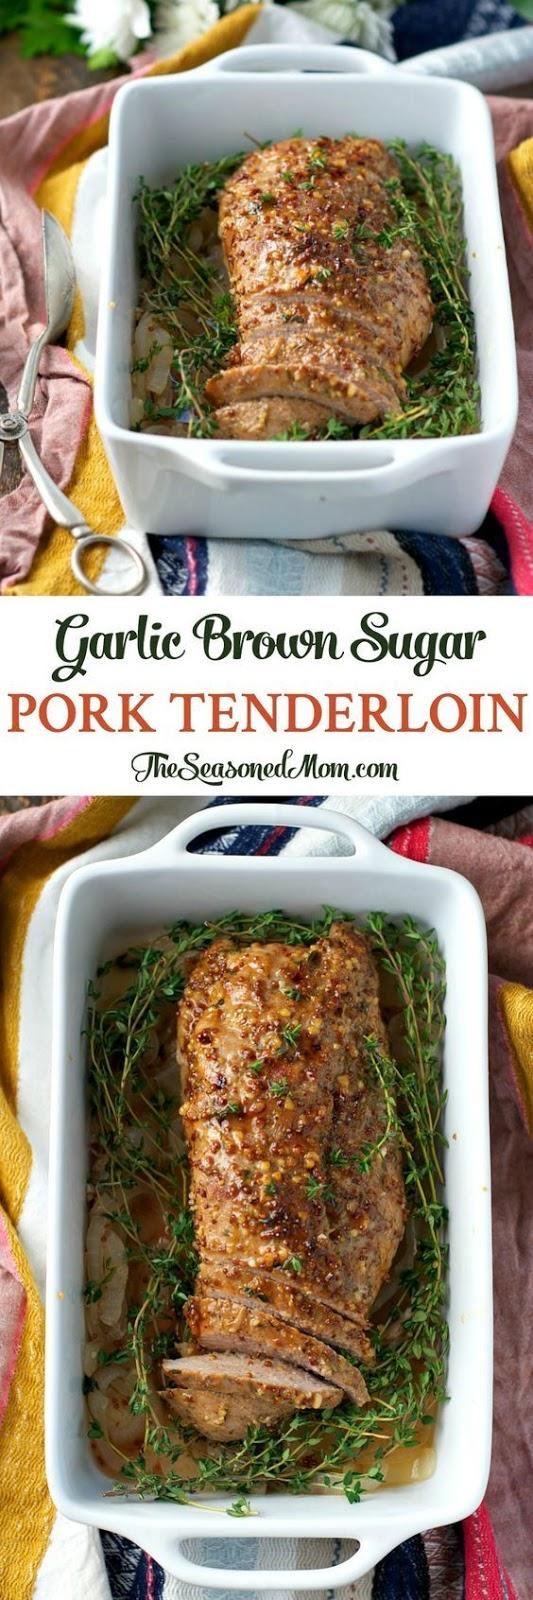 Garlic Brown Sugar Pork Tenderloin